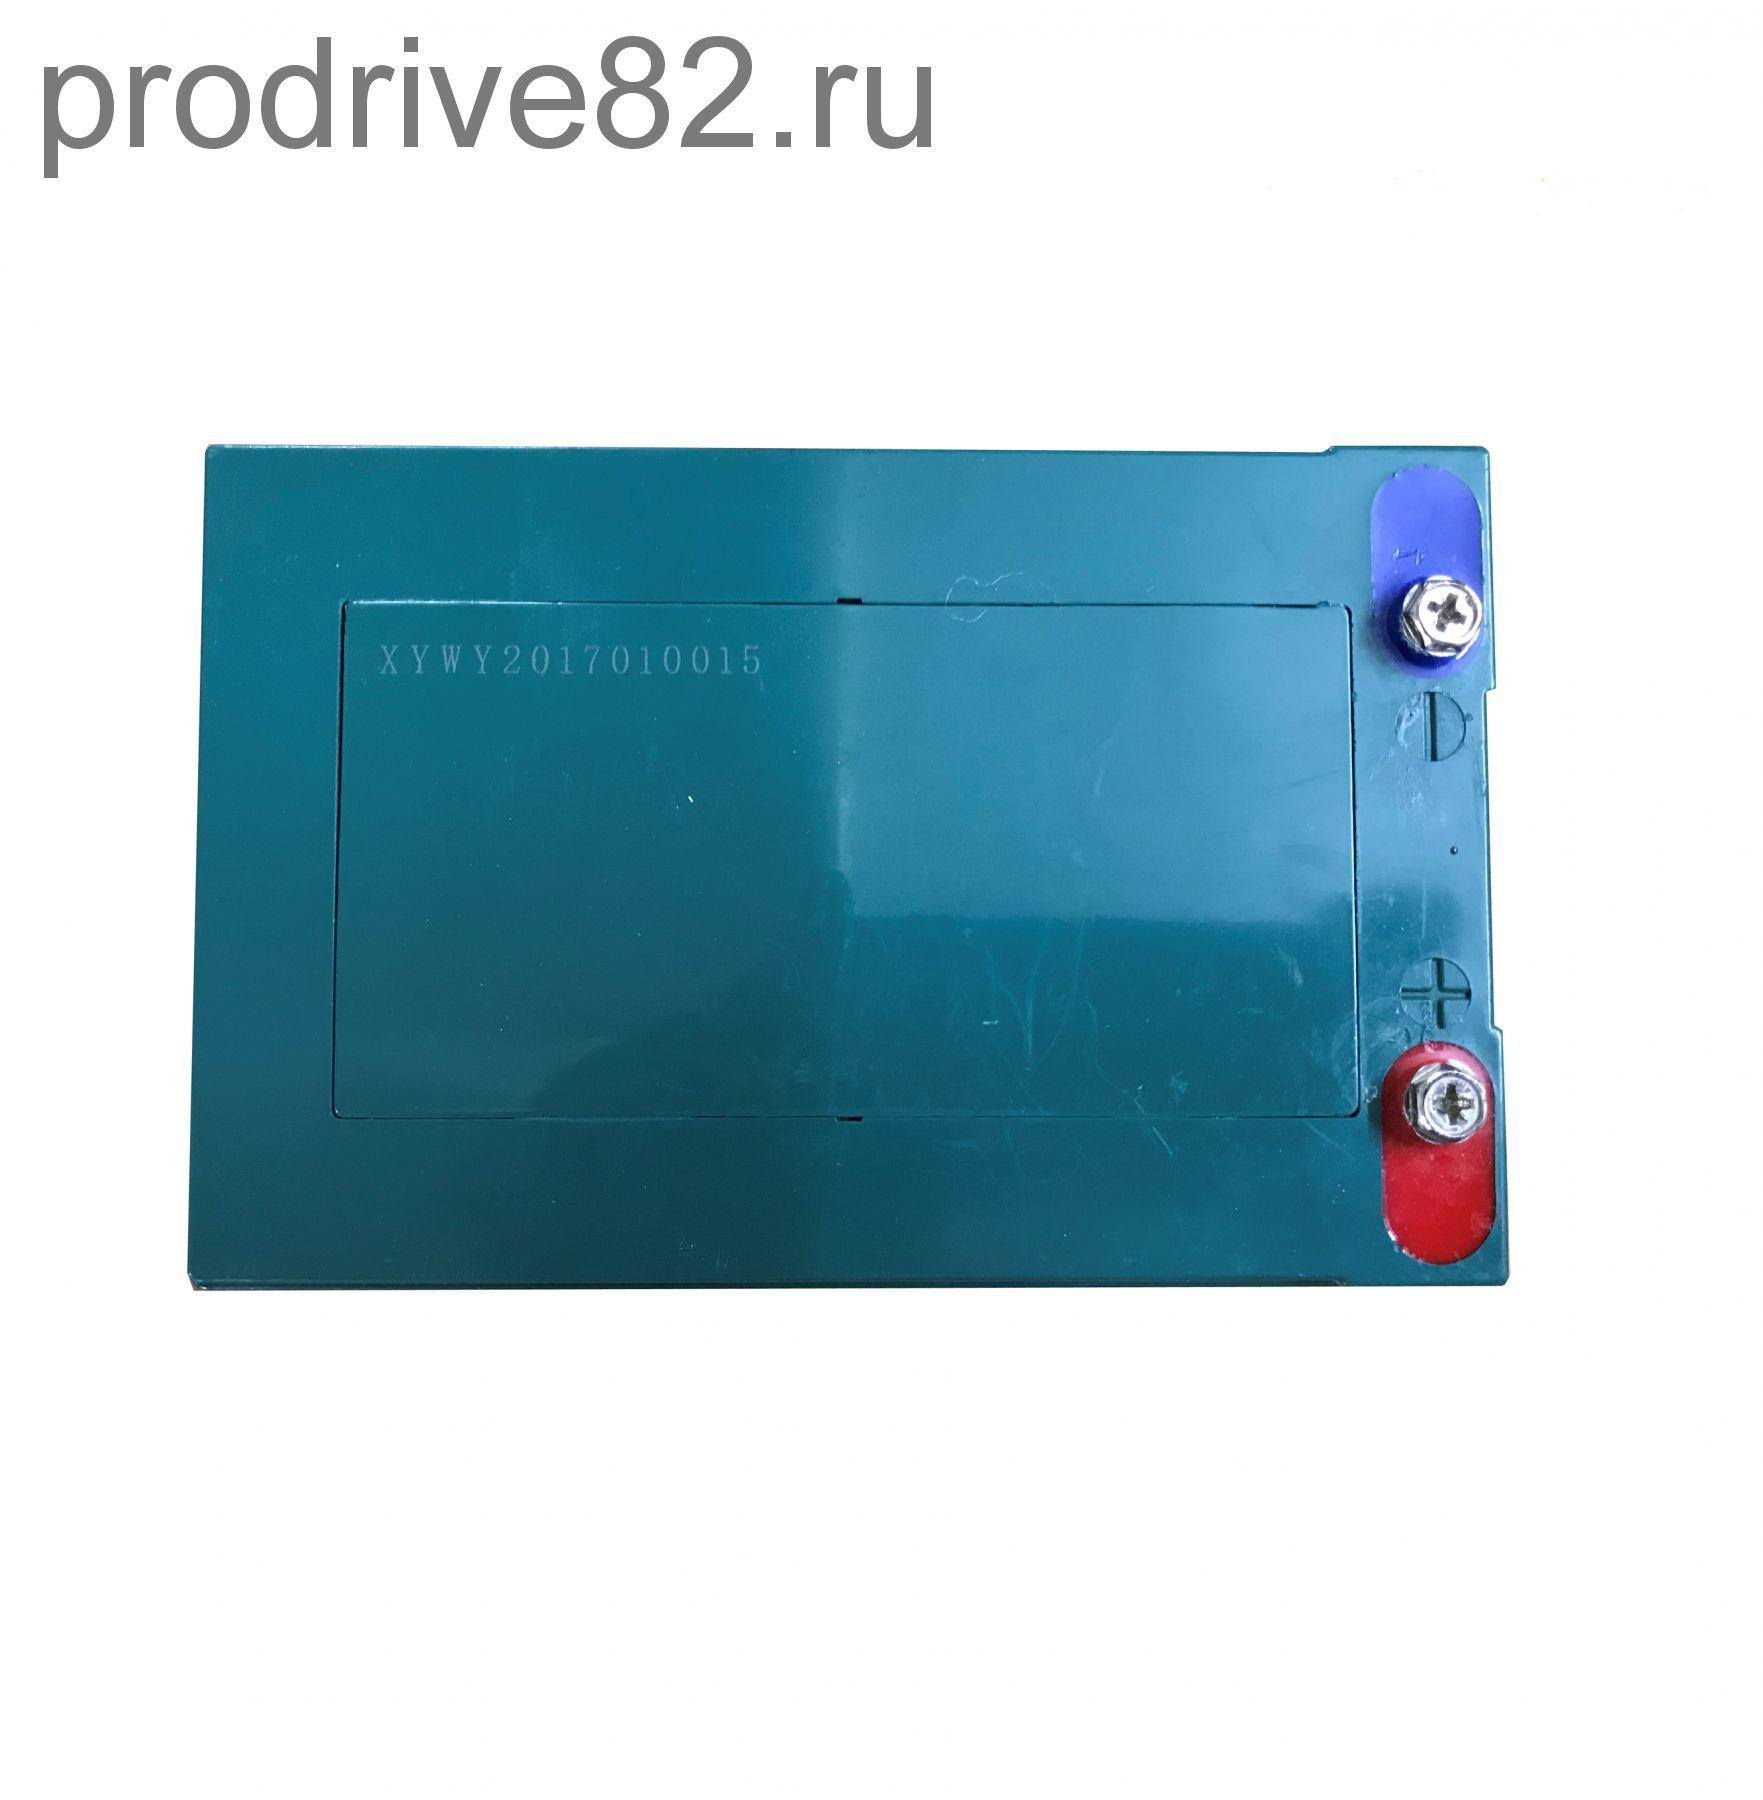 Комплект аккумуляторных батарей 3х12V12АН